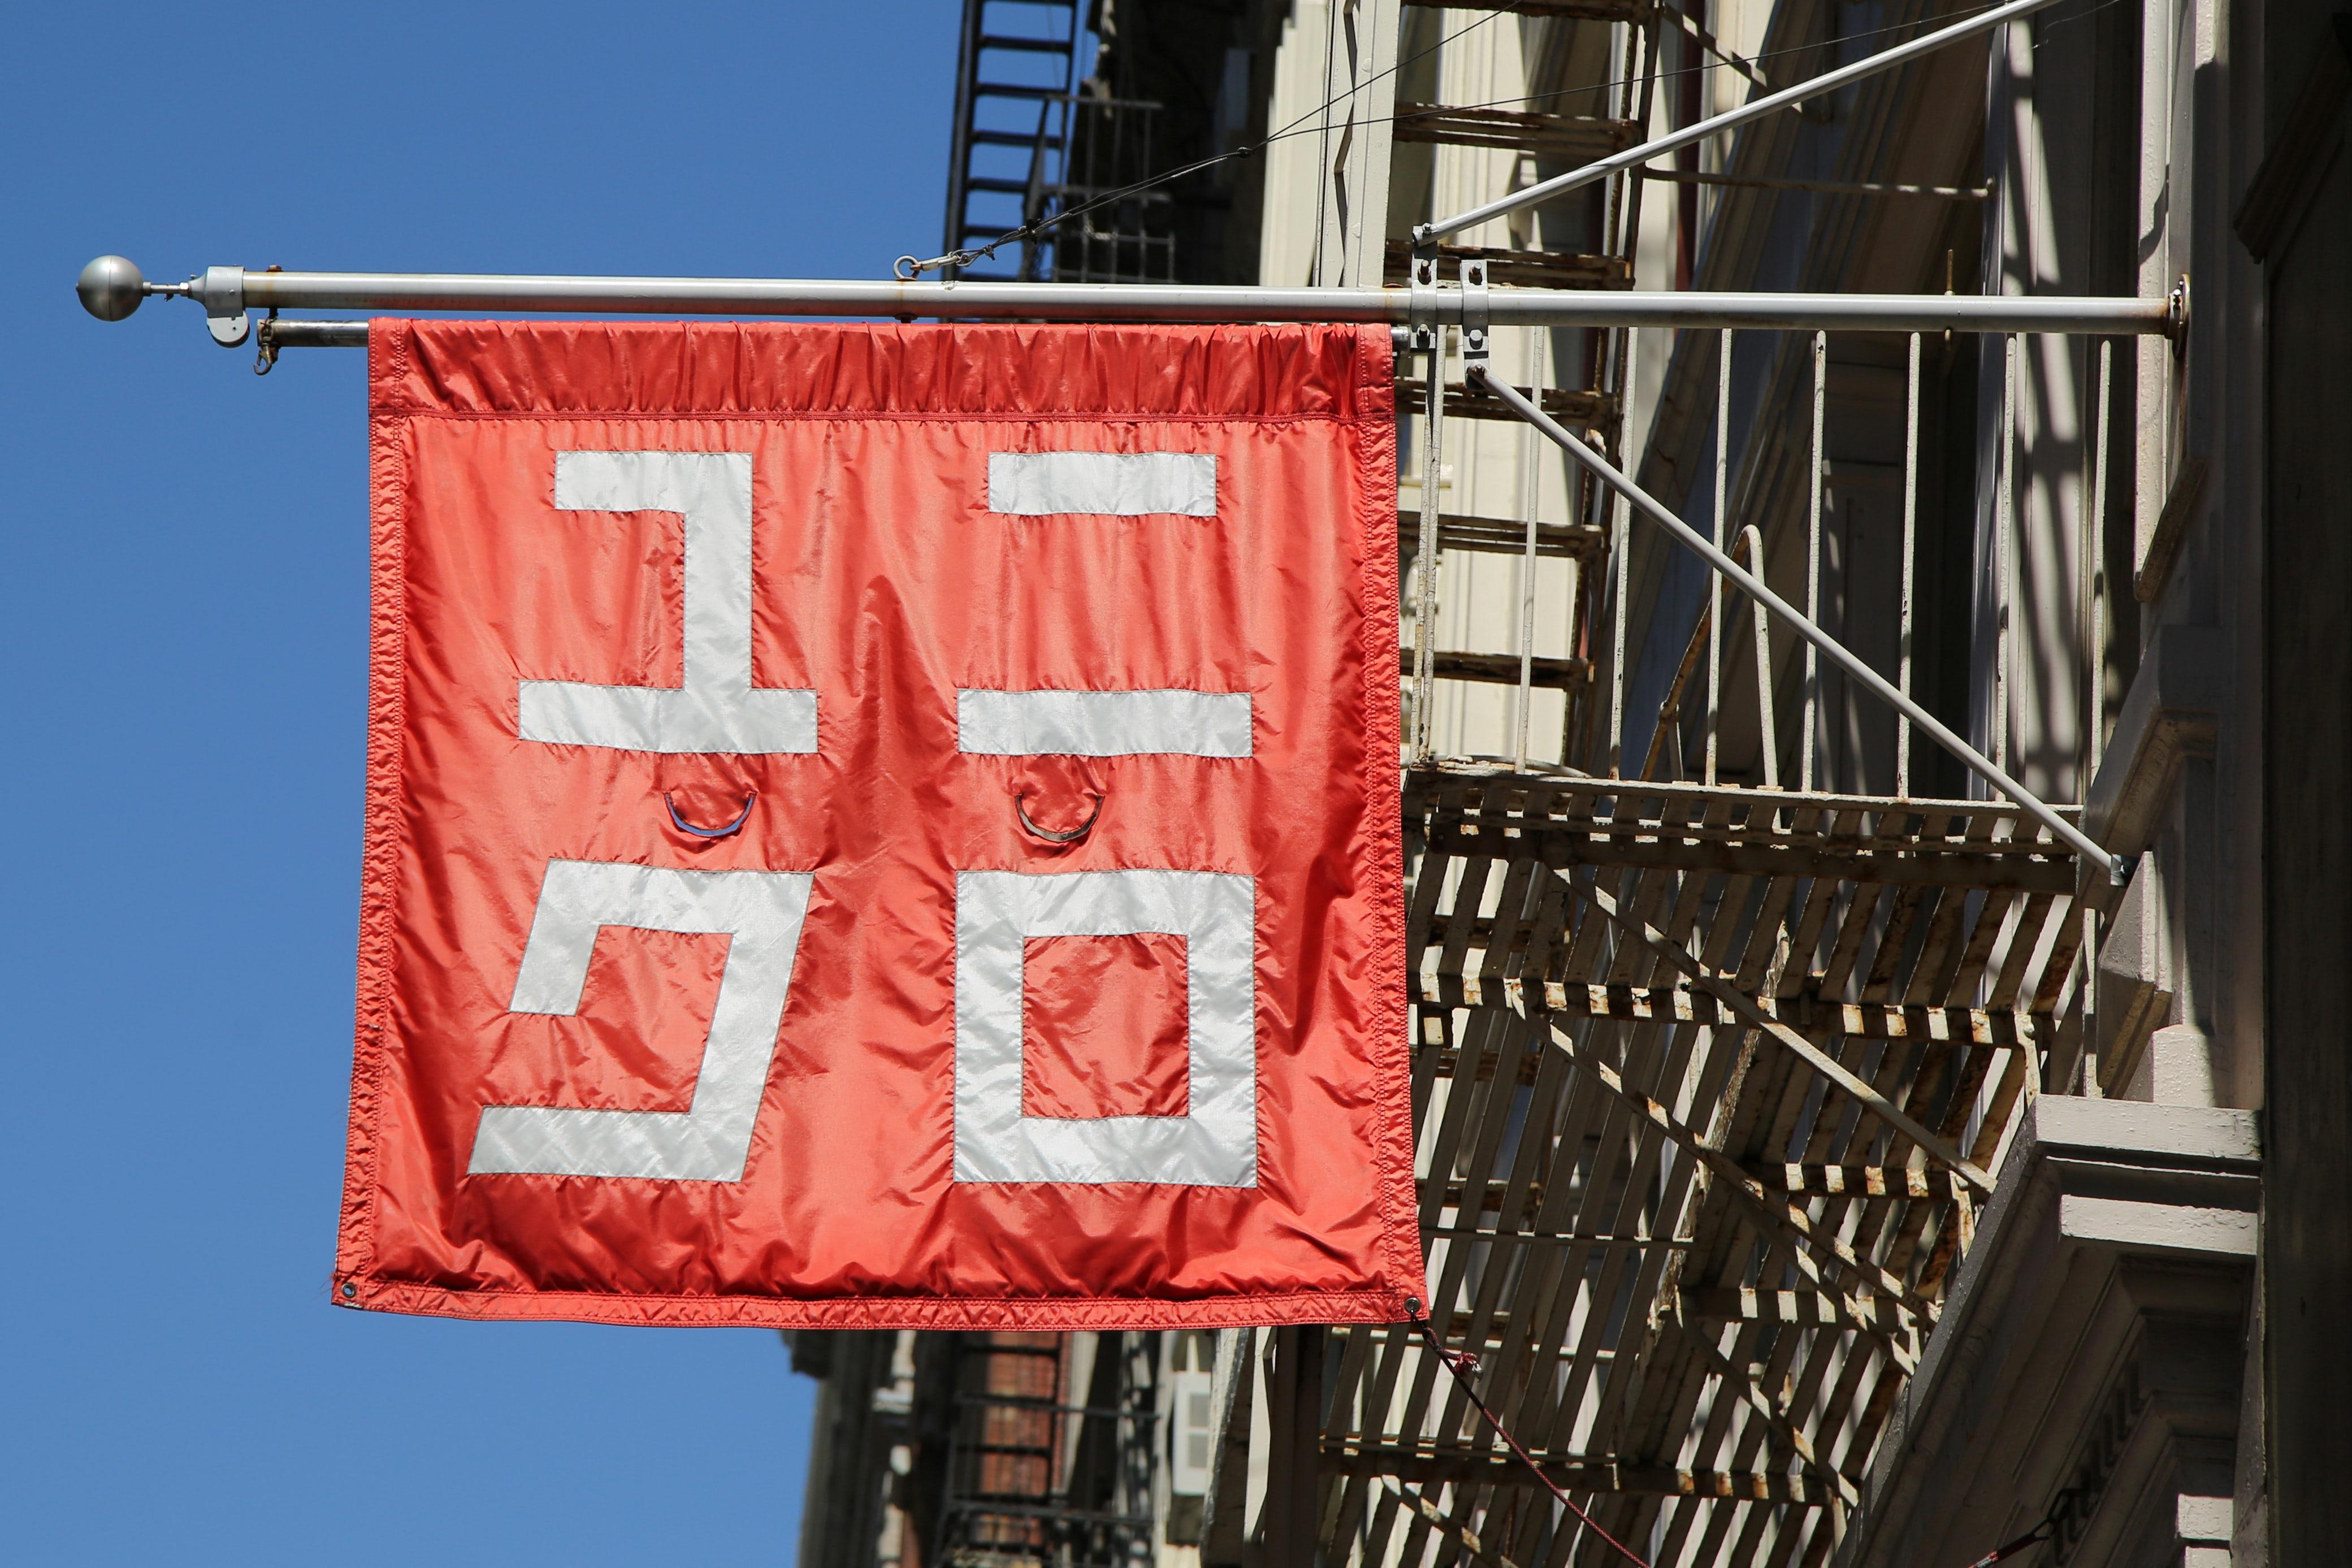 The Uniqlo store in New York's SoHo neighbourhood | Source: Shutterstock